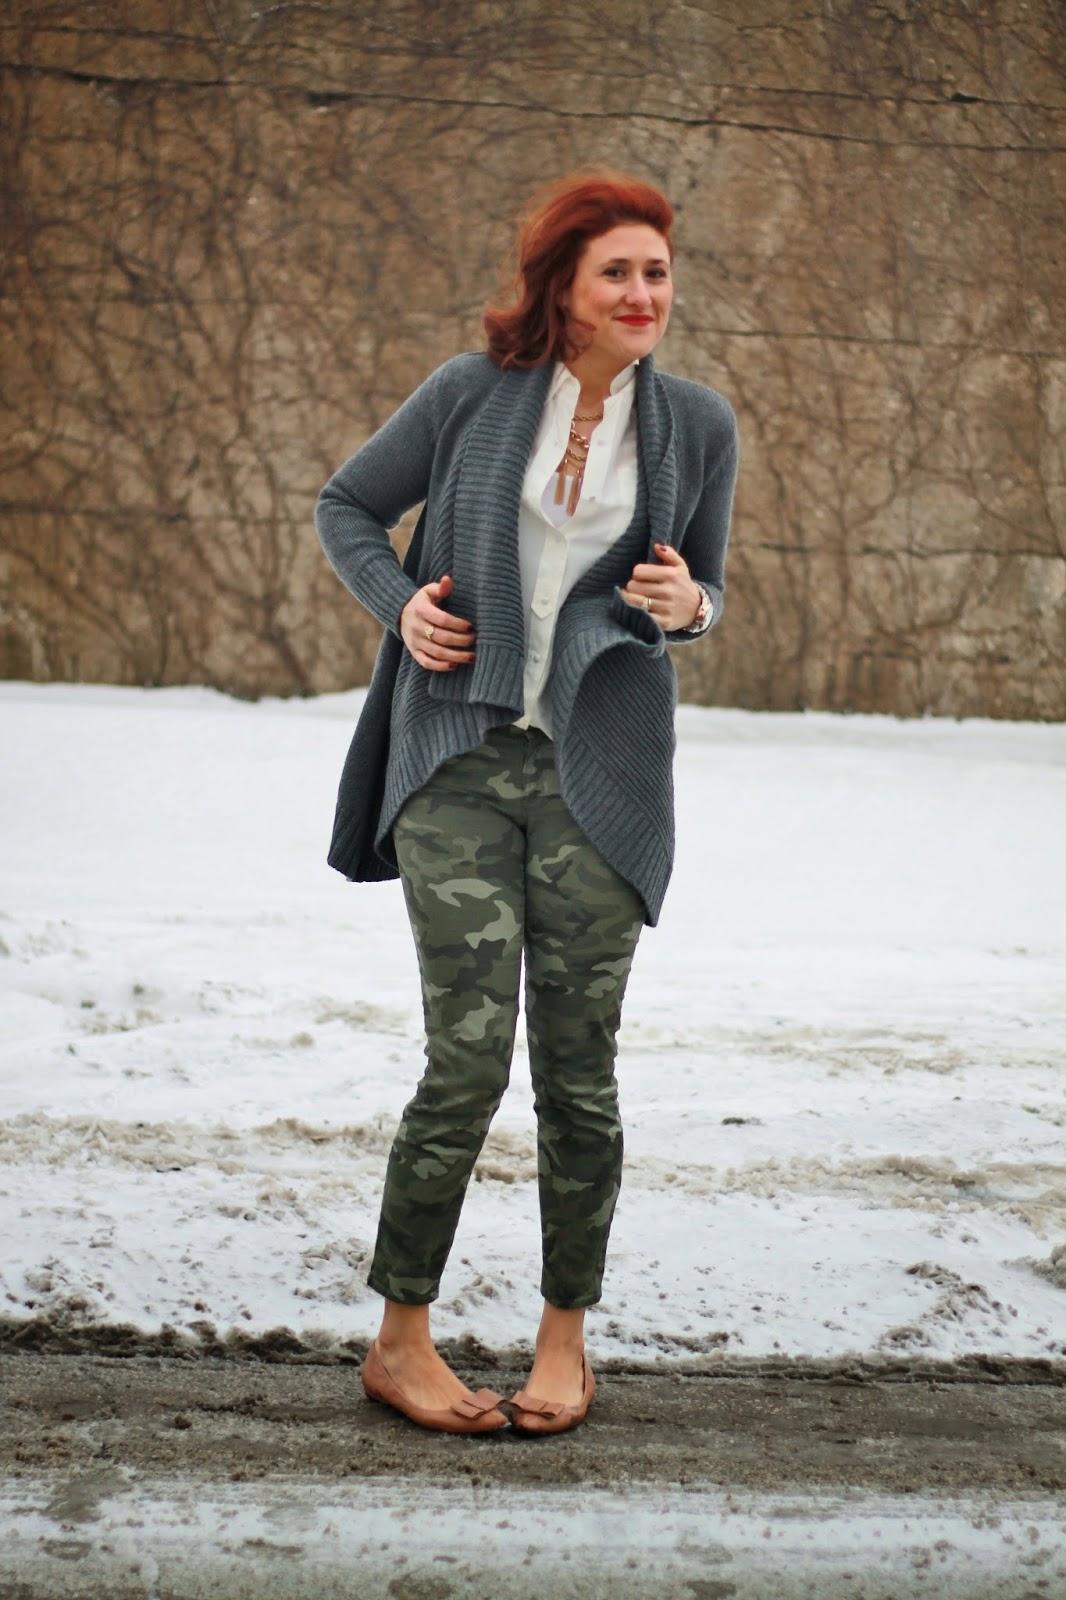 shawl, sweater